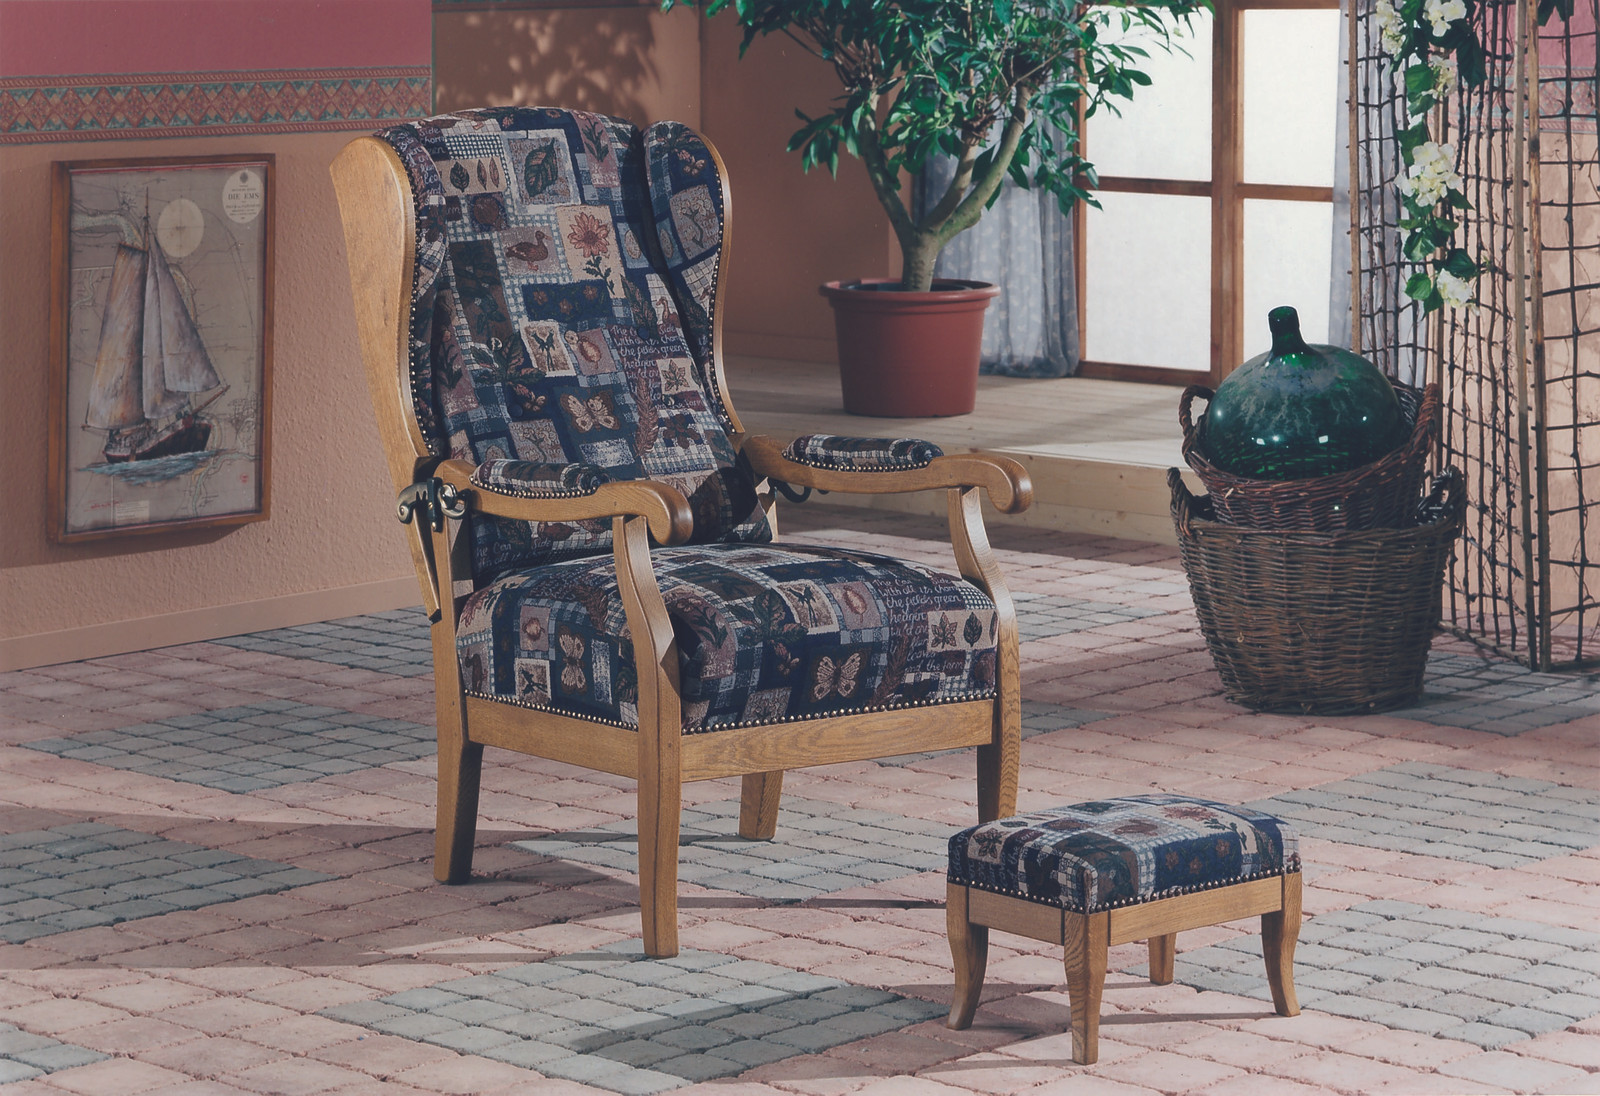 Hochlehner Sessel mit Hocker, hoher Sessel, Eiche massiv, gelaugt ...